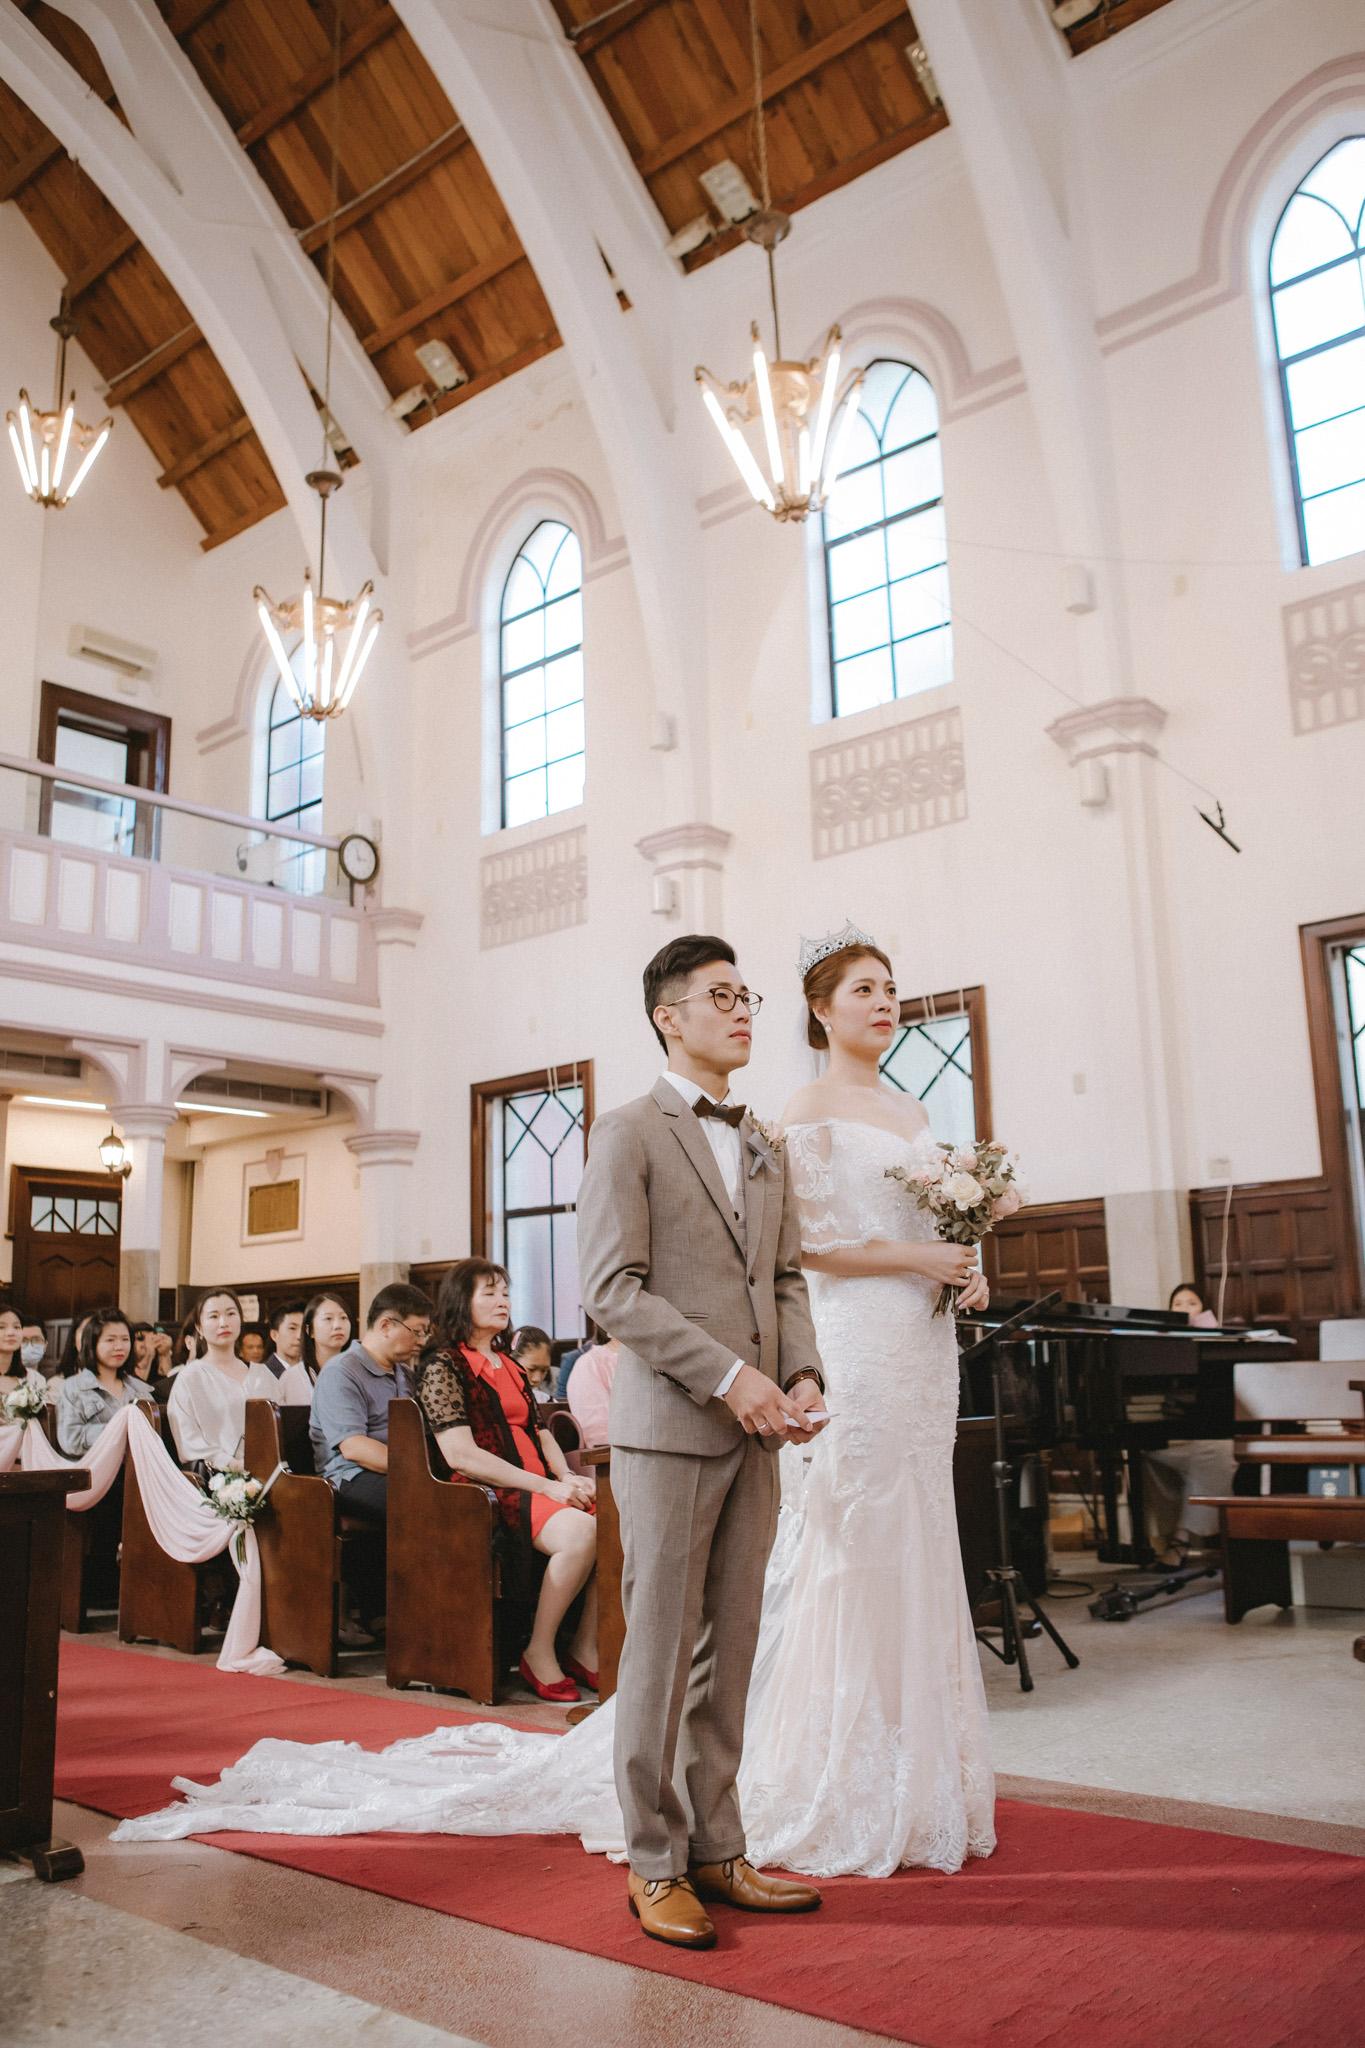 EW 台北婚攝 居米 濟南教會 Brick Yard 33 美軍俱樂部 婚禮 婚宴-44